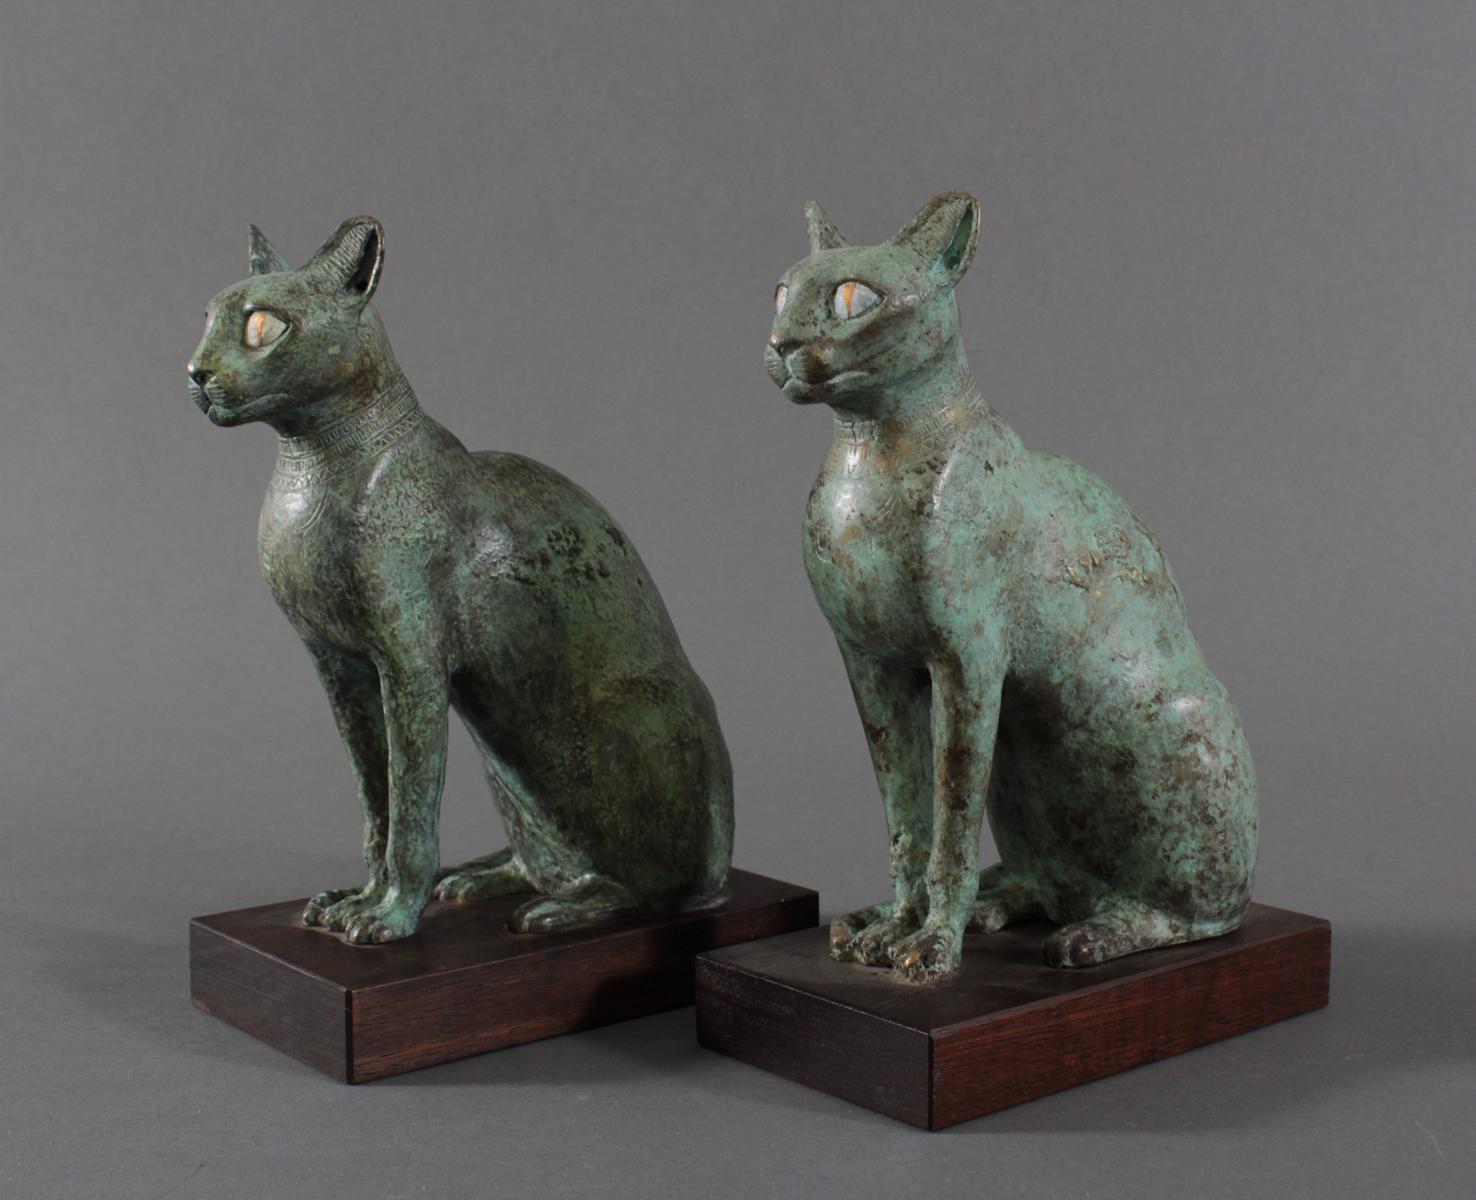 Paar Katzenfiguren aus Bronze,der Göttin Bastet Lieblingstier, Votivfiguren-3